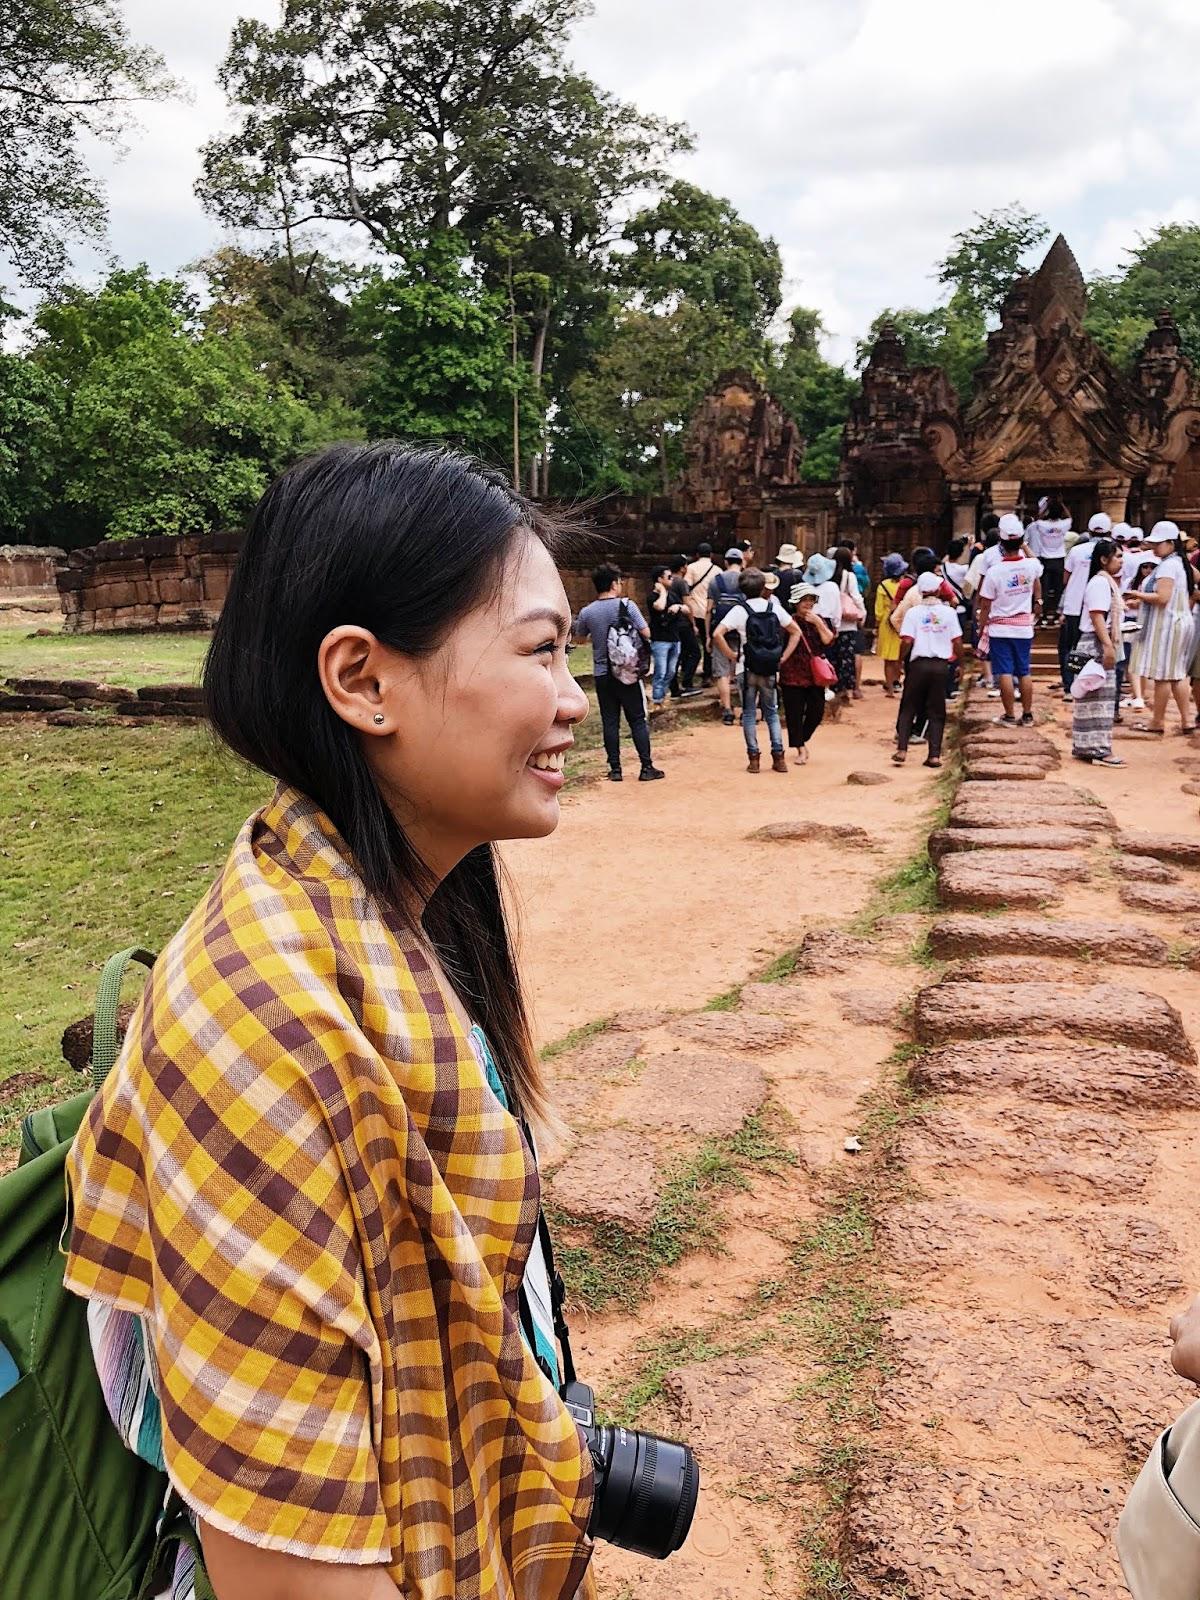 Smiling inside Banteay Srei